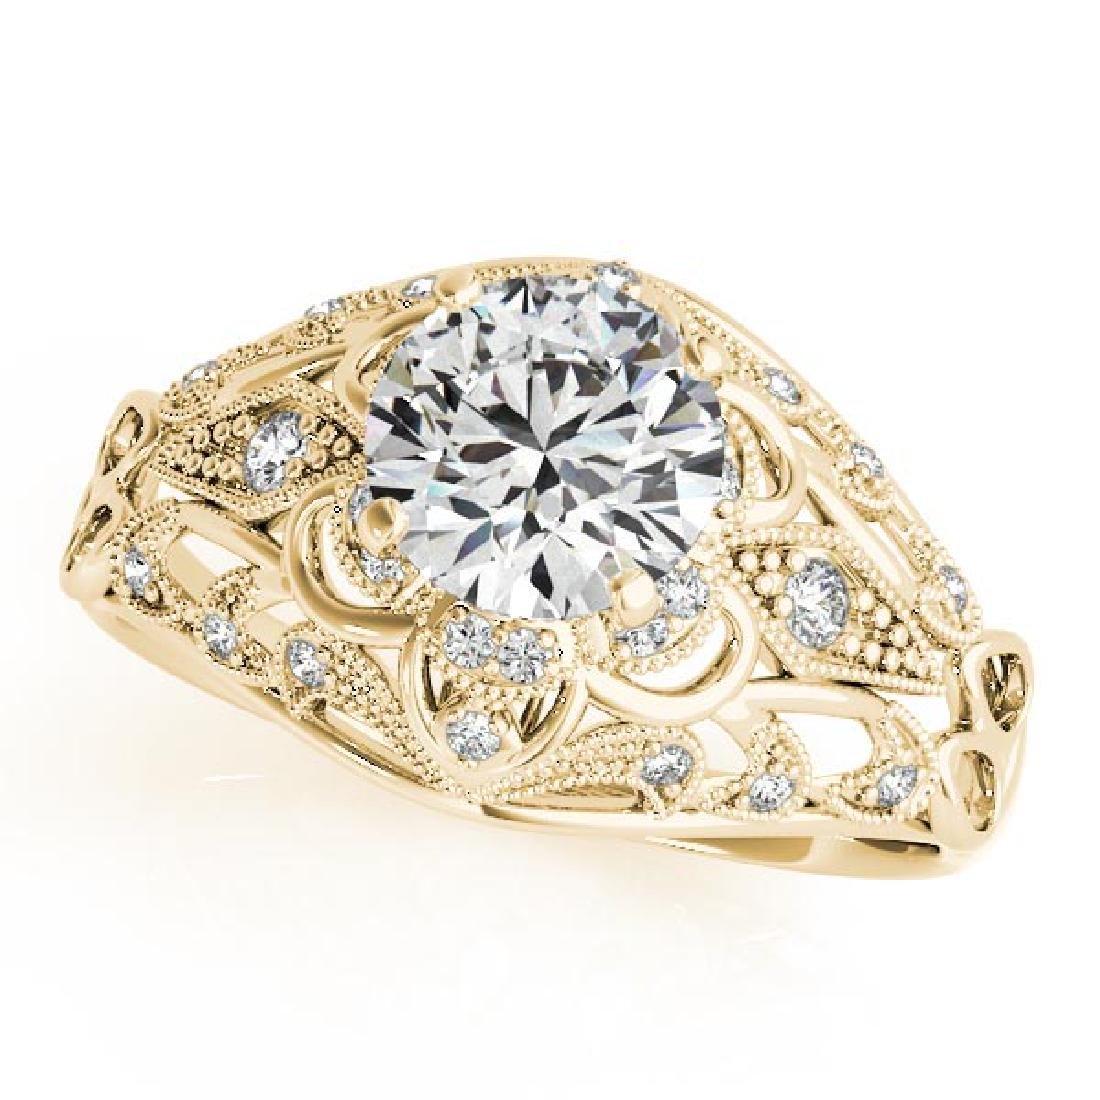 CERTIFIED 18K YELLOW GOLD 0.79 CT G-H/VS-SI1 DIAMOND HA